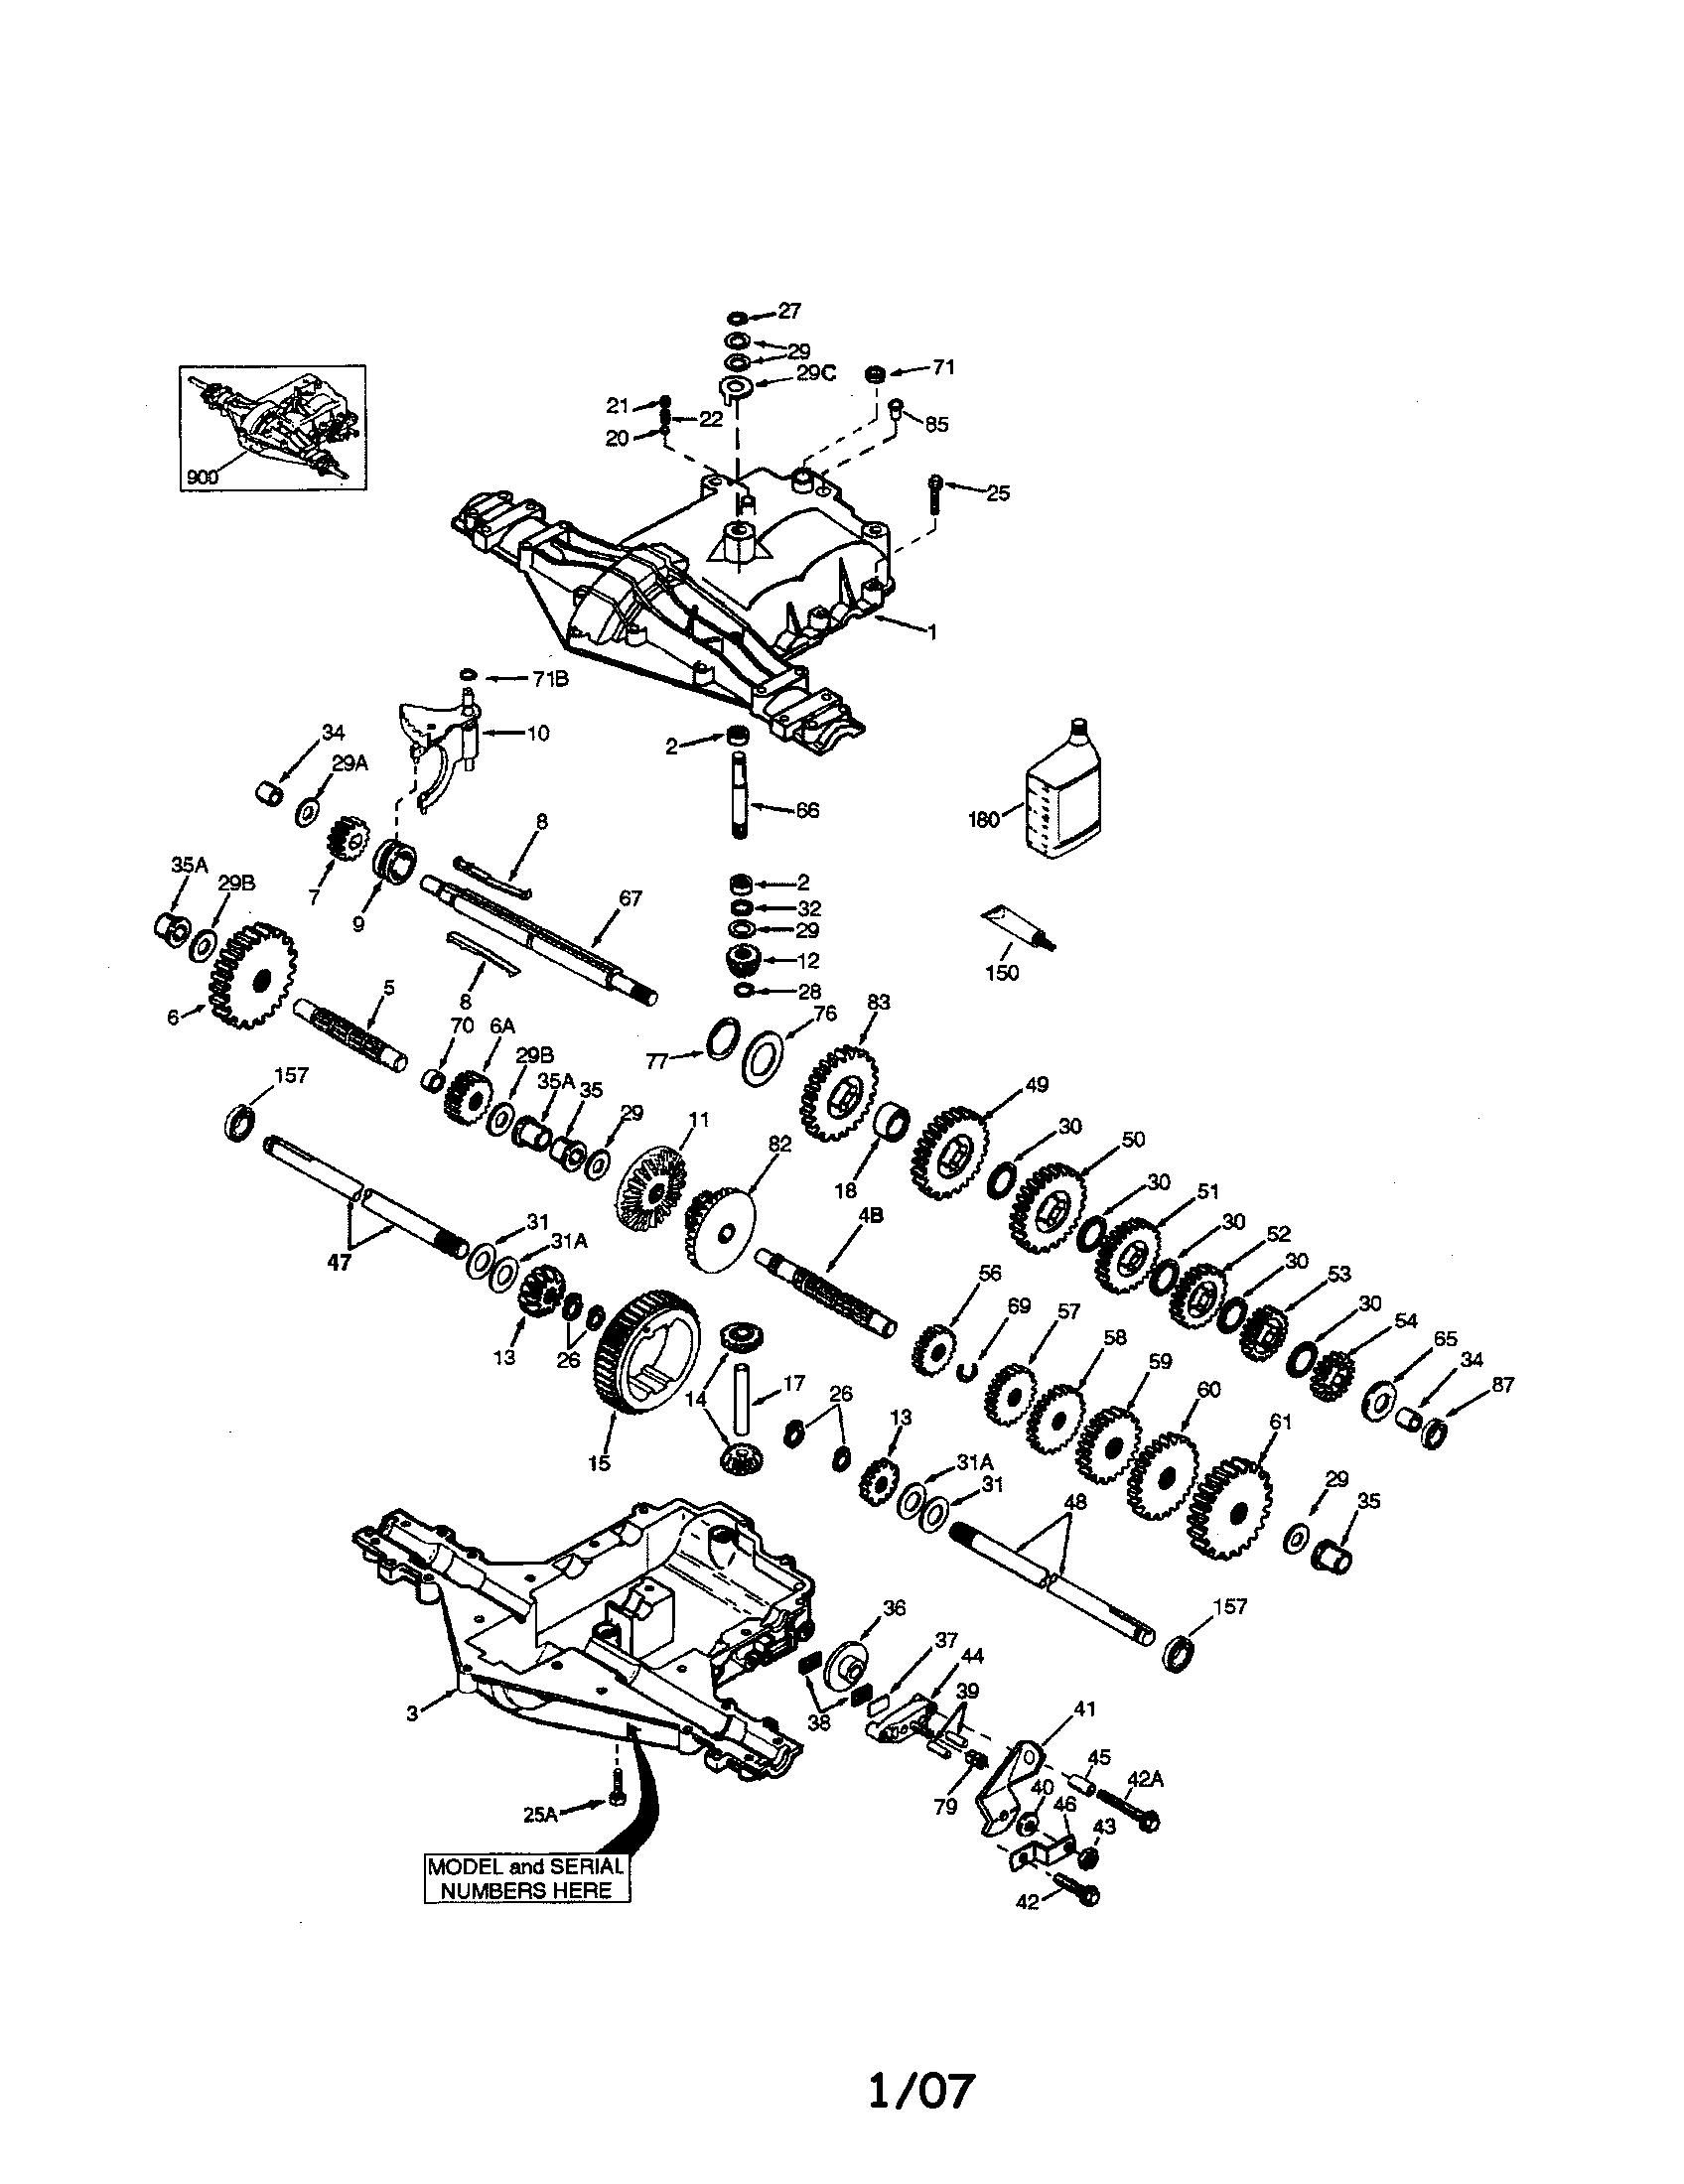 hight resolution of kium sportage 1997 wiring diagram